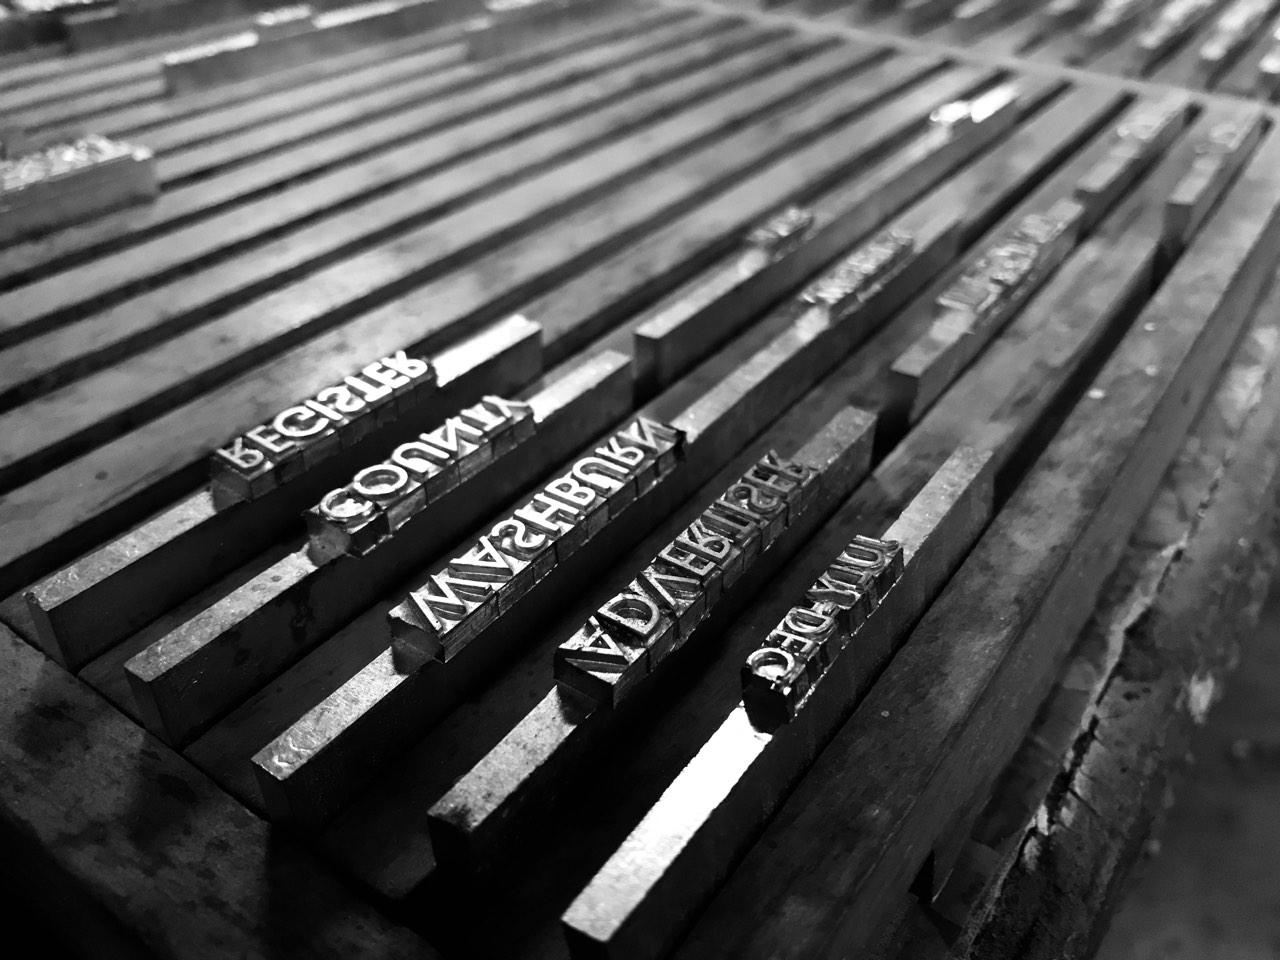 Ludlow cast type in slugs for letterpress printing